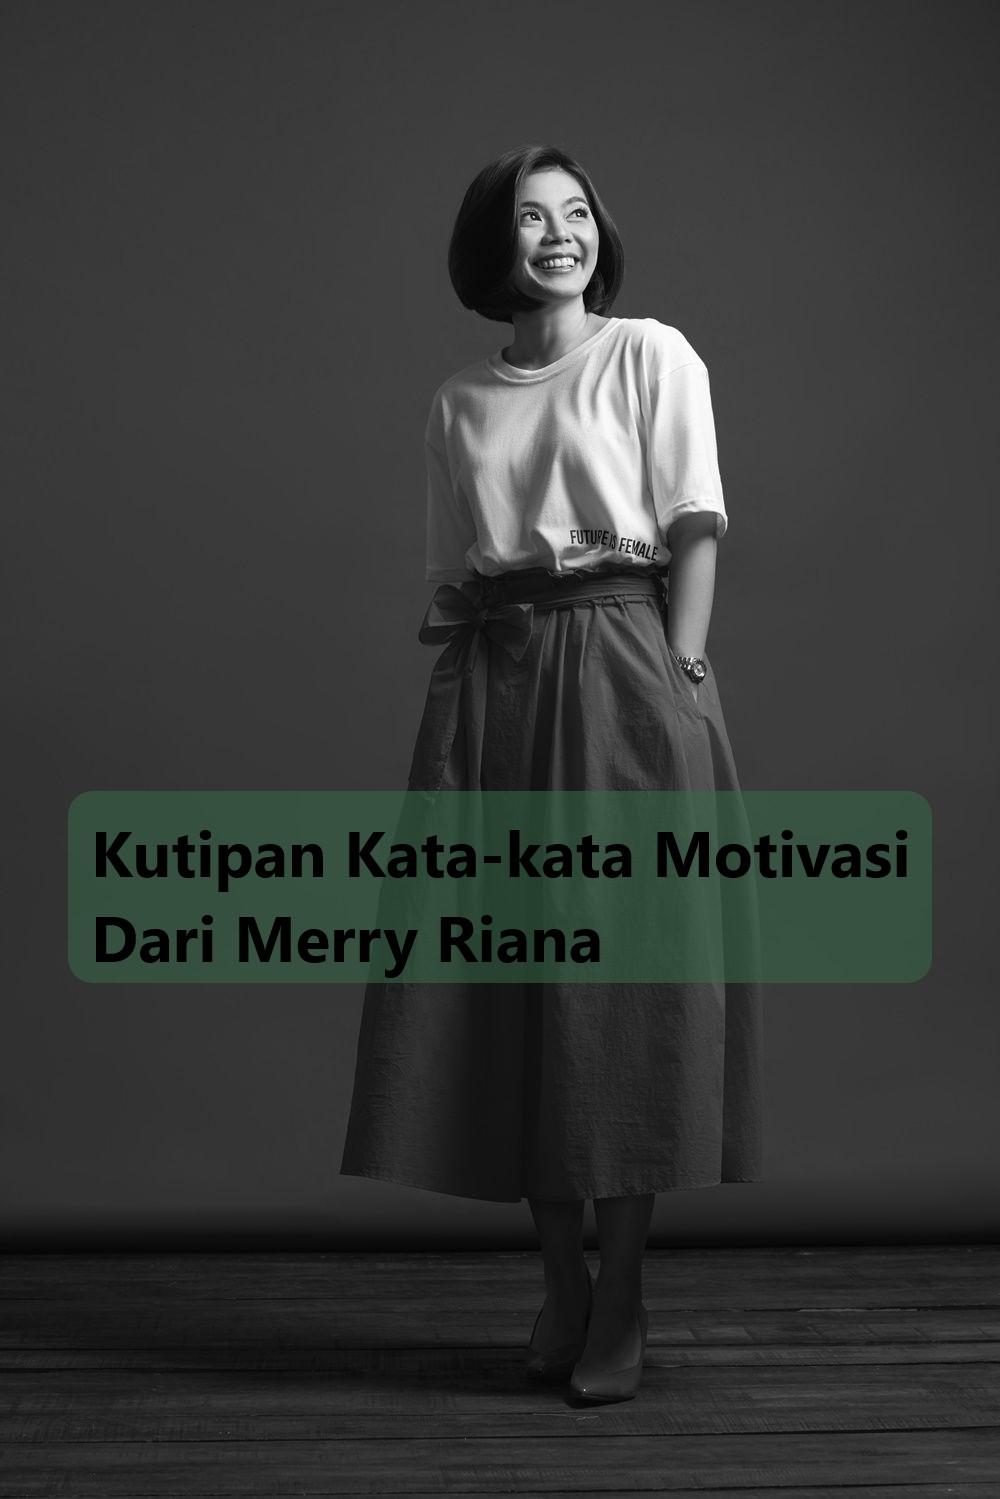 Kutipan Kata-kata Motivasi Dari Merry Riana